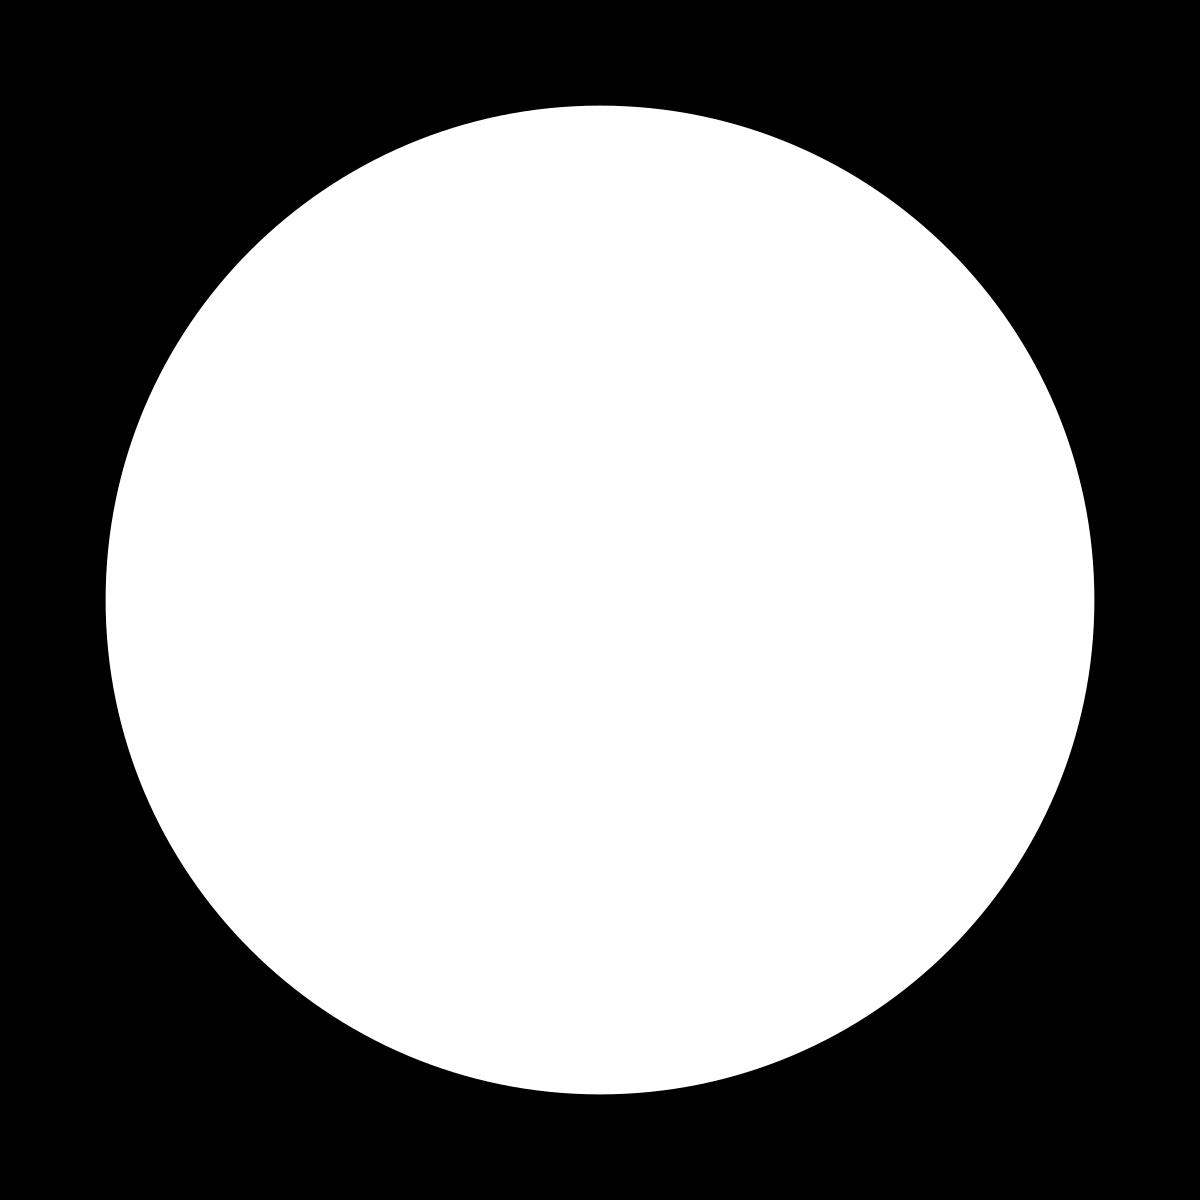 1200px-Circle_-_black_simple.svg.png